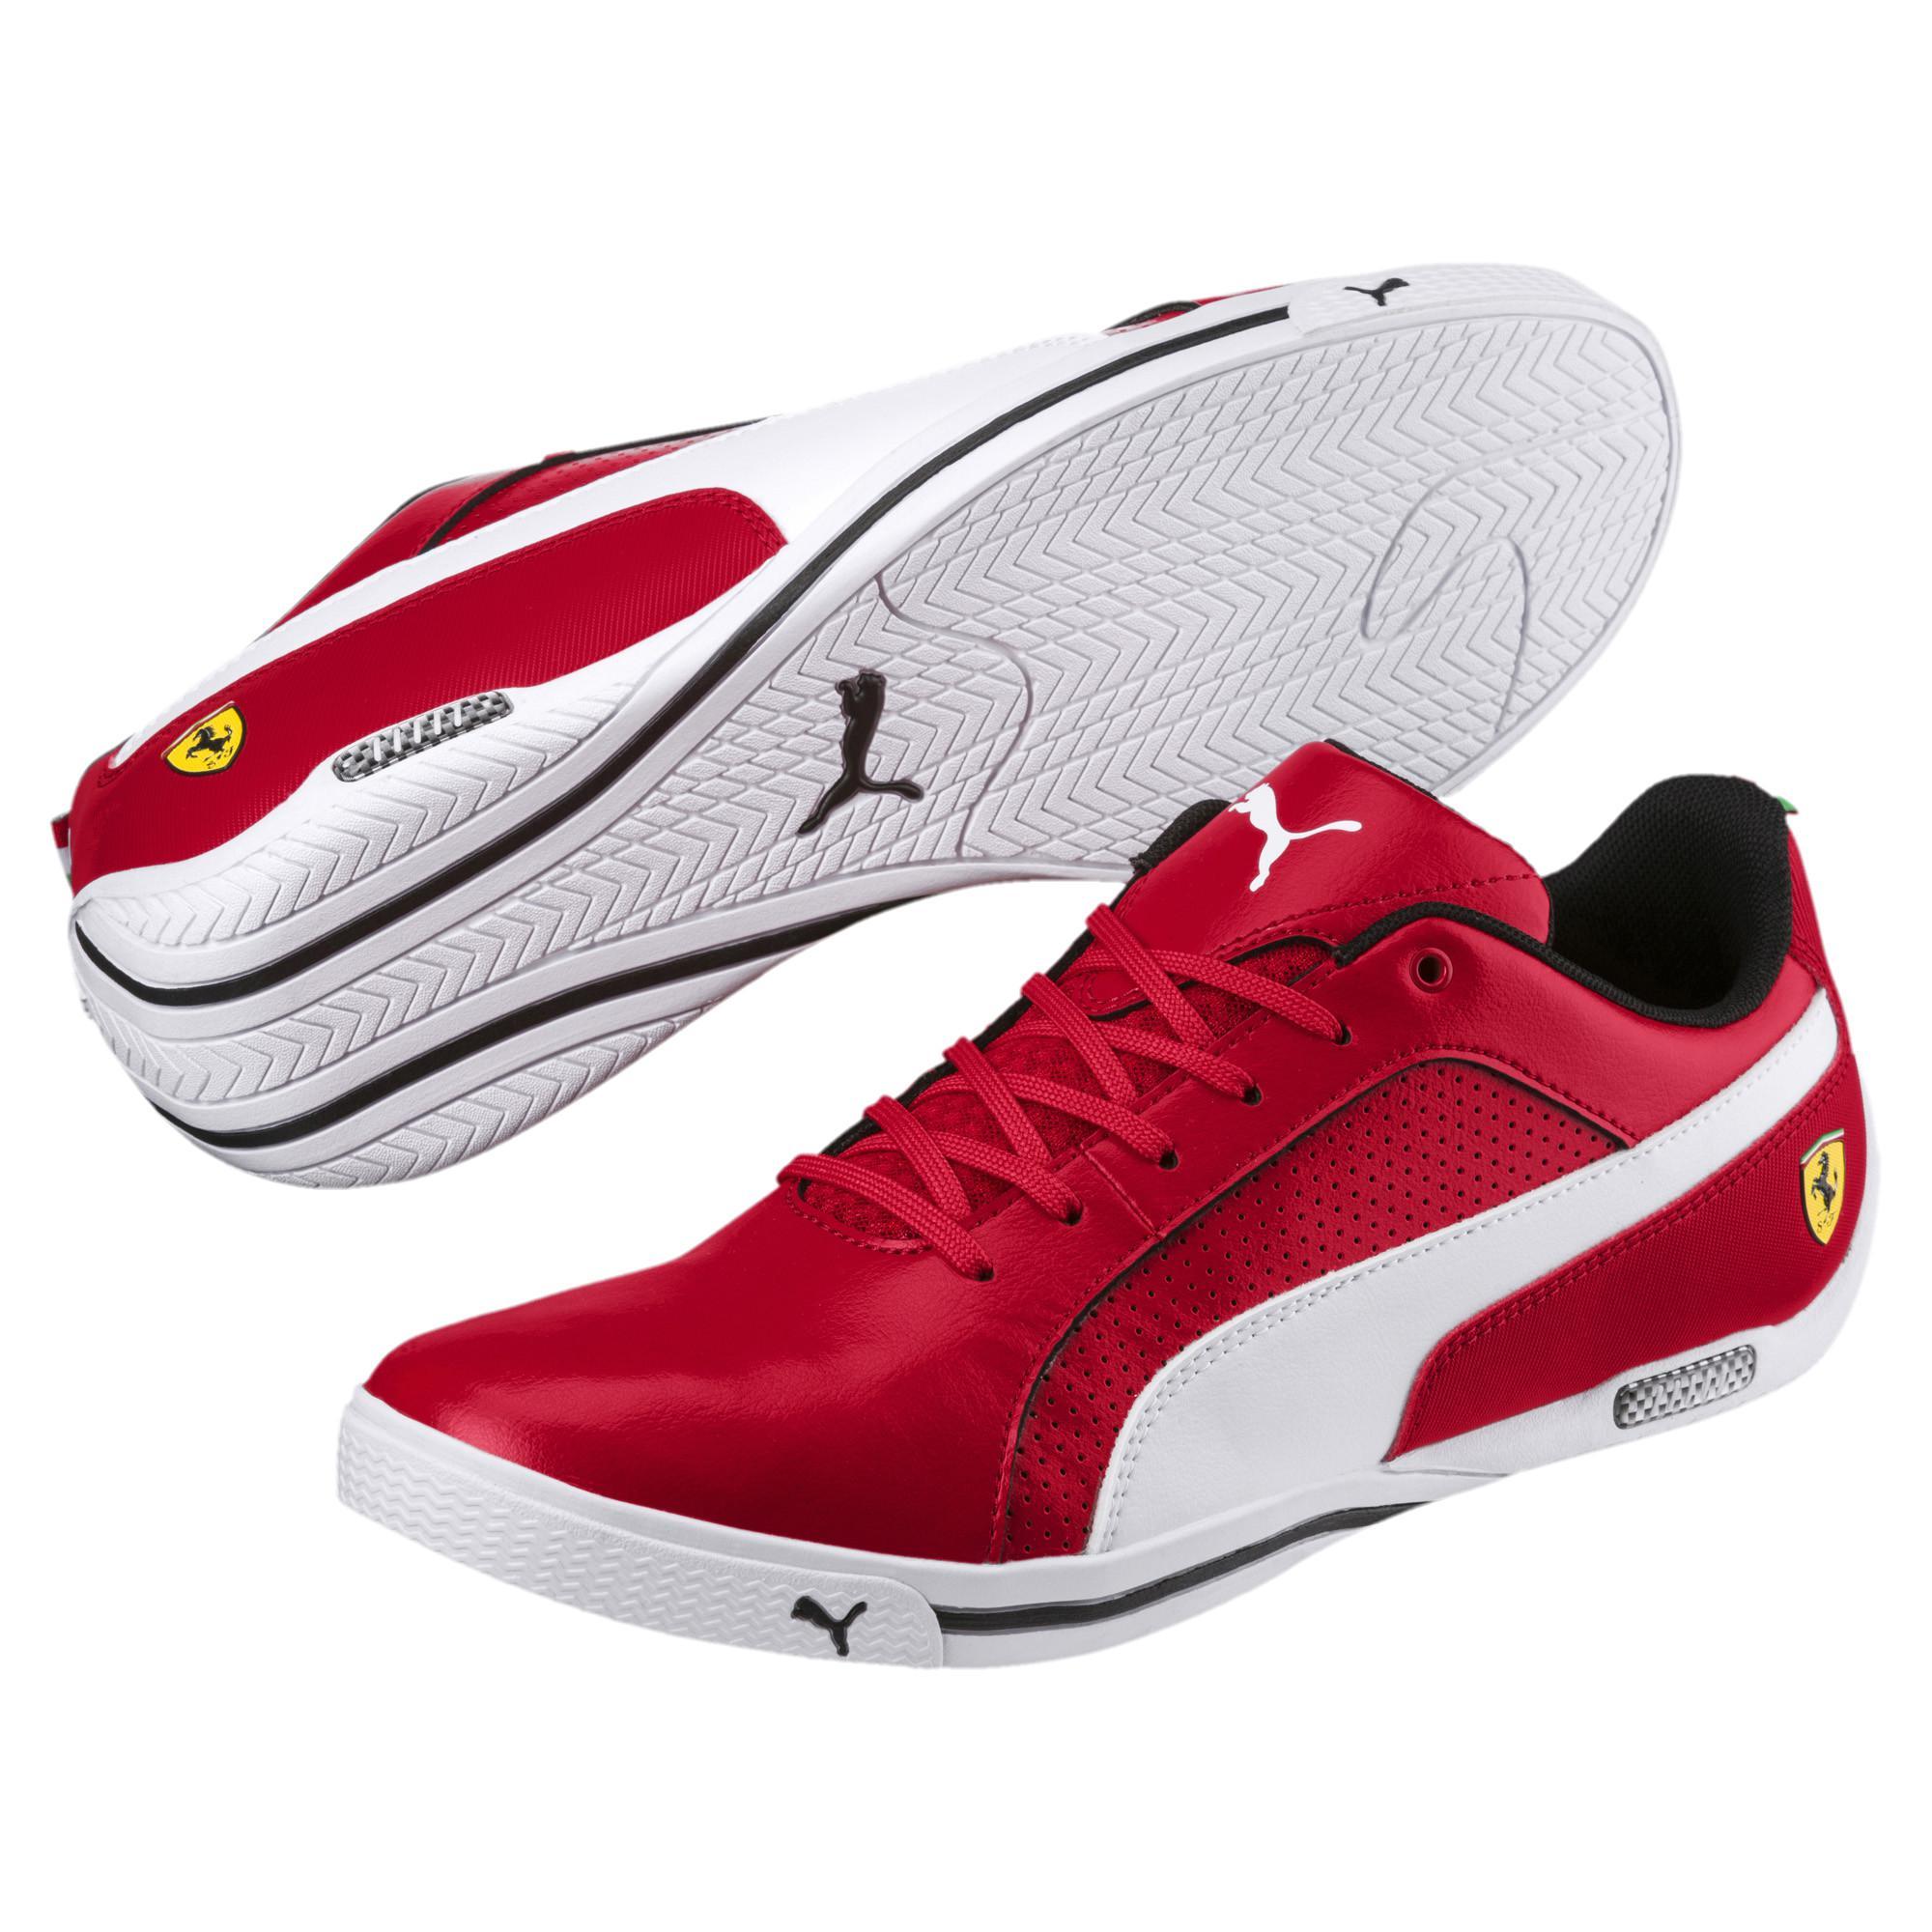 ... amazon puma red ferrari selezione ii mens sneakers for men lyst. view  fullscreen 618ab ace9a 1a0d2238a